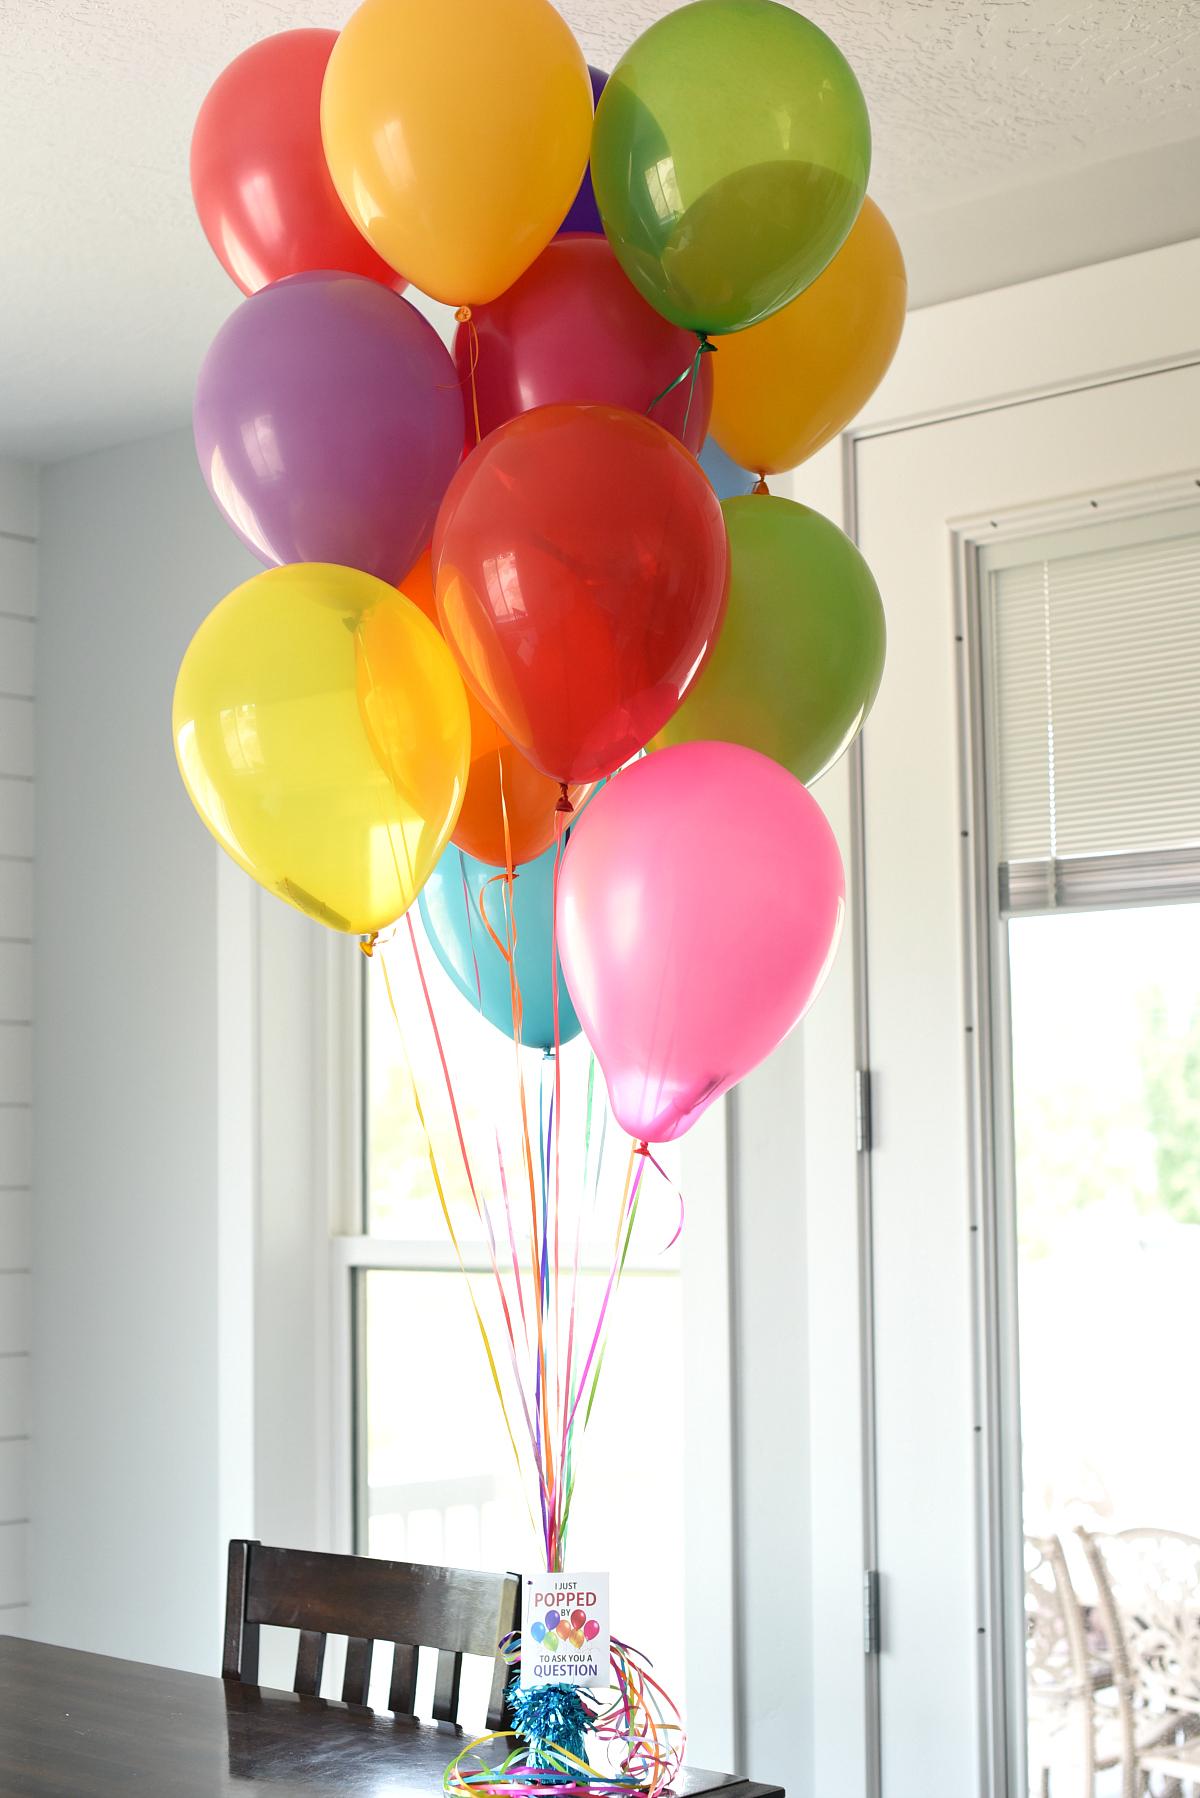 Fun Promposal Ideas with Balloons